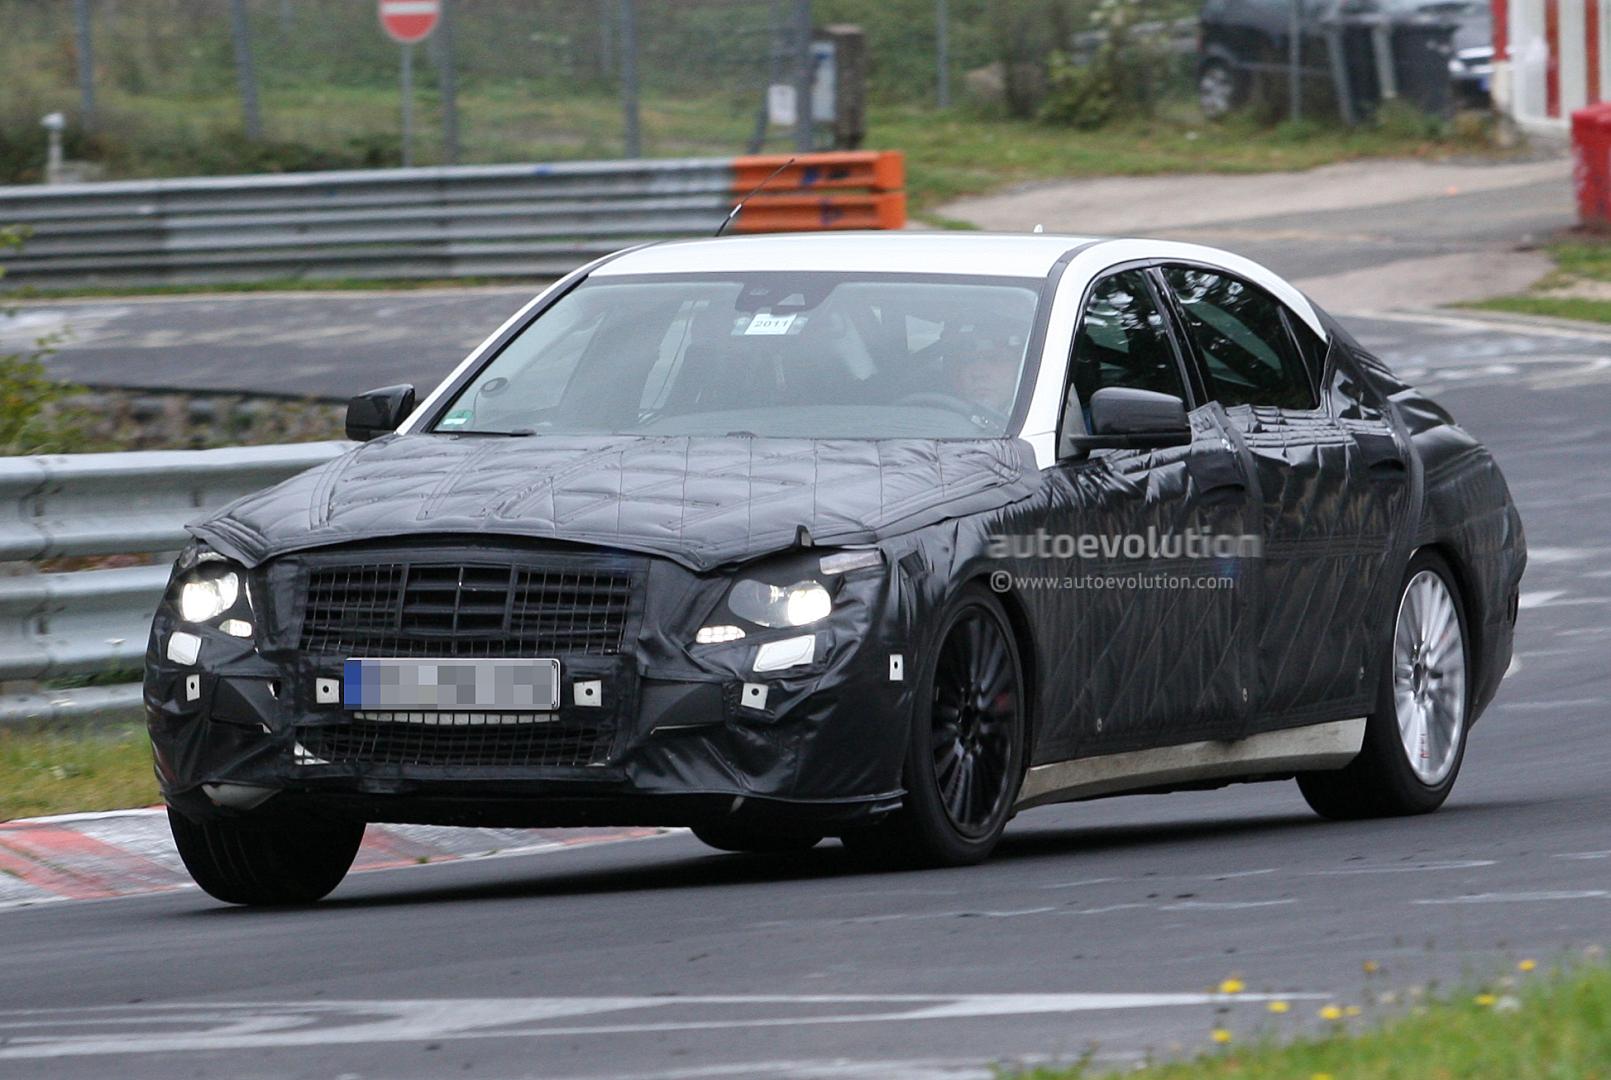 Spyshots 2013 mercedes benz s class autoevolution for Mercedes benz s class 2013